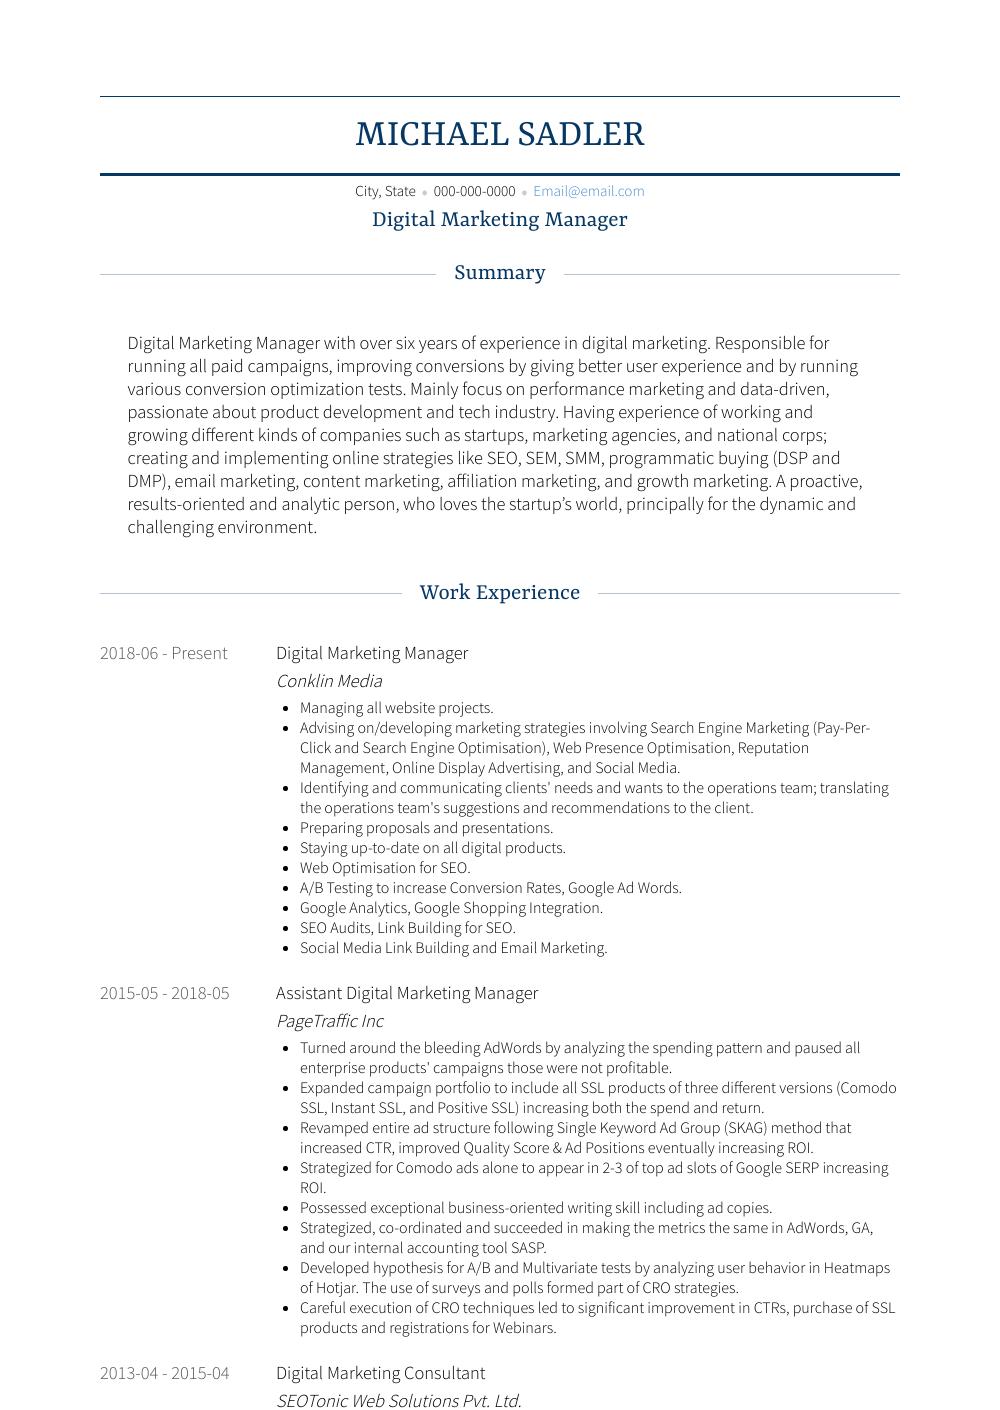 Digital Marketing - Resume Samples & Templates | VisualCV